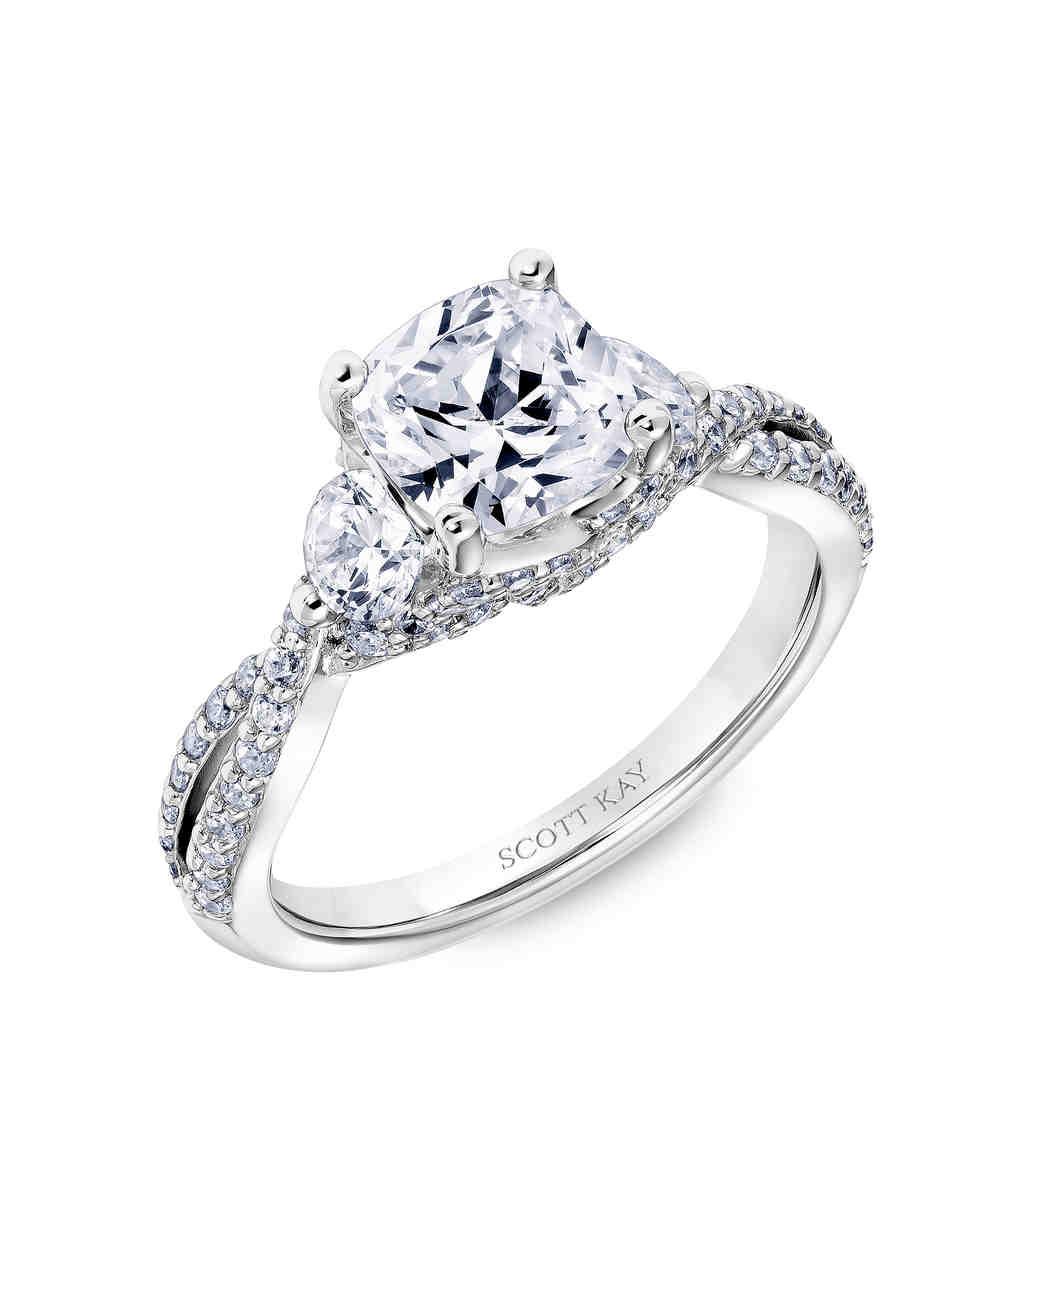 CushionCut Diamond Engagement Rings  Martha Stewart Weddings